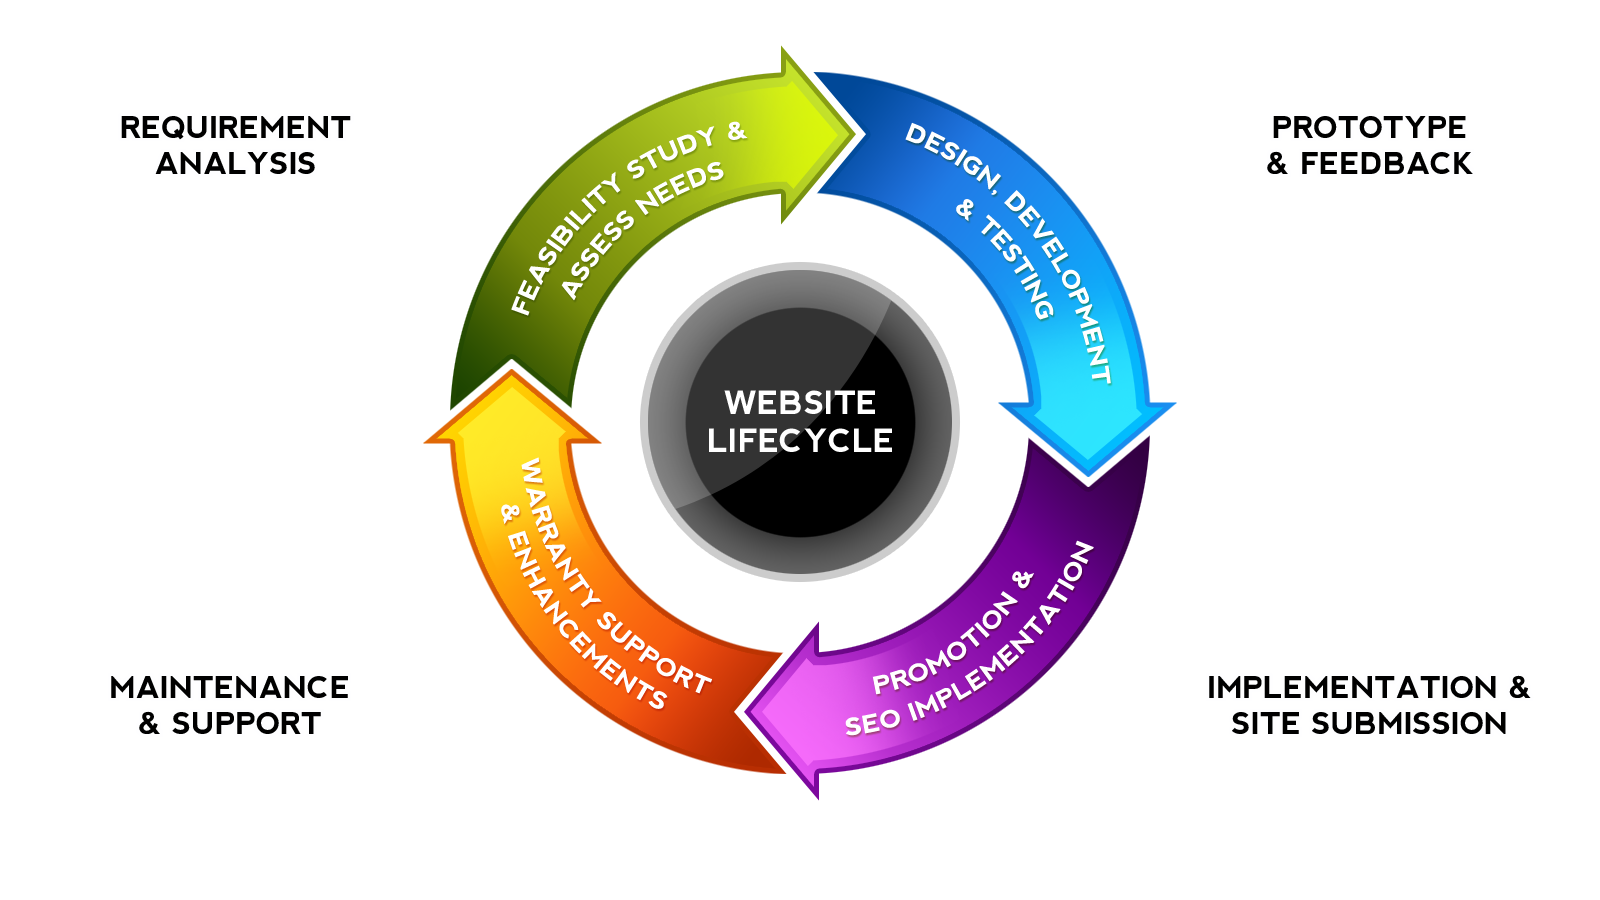 Web Design Life Cycle